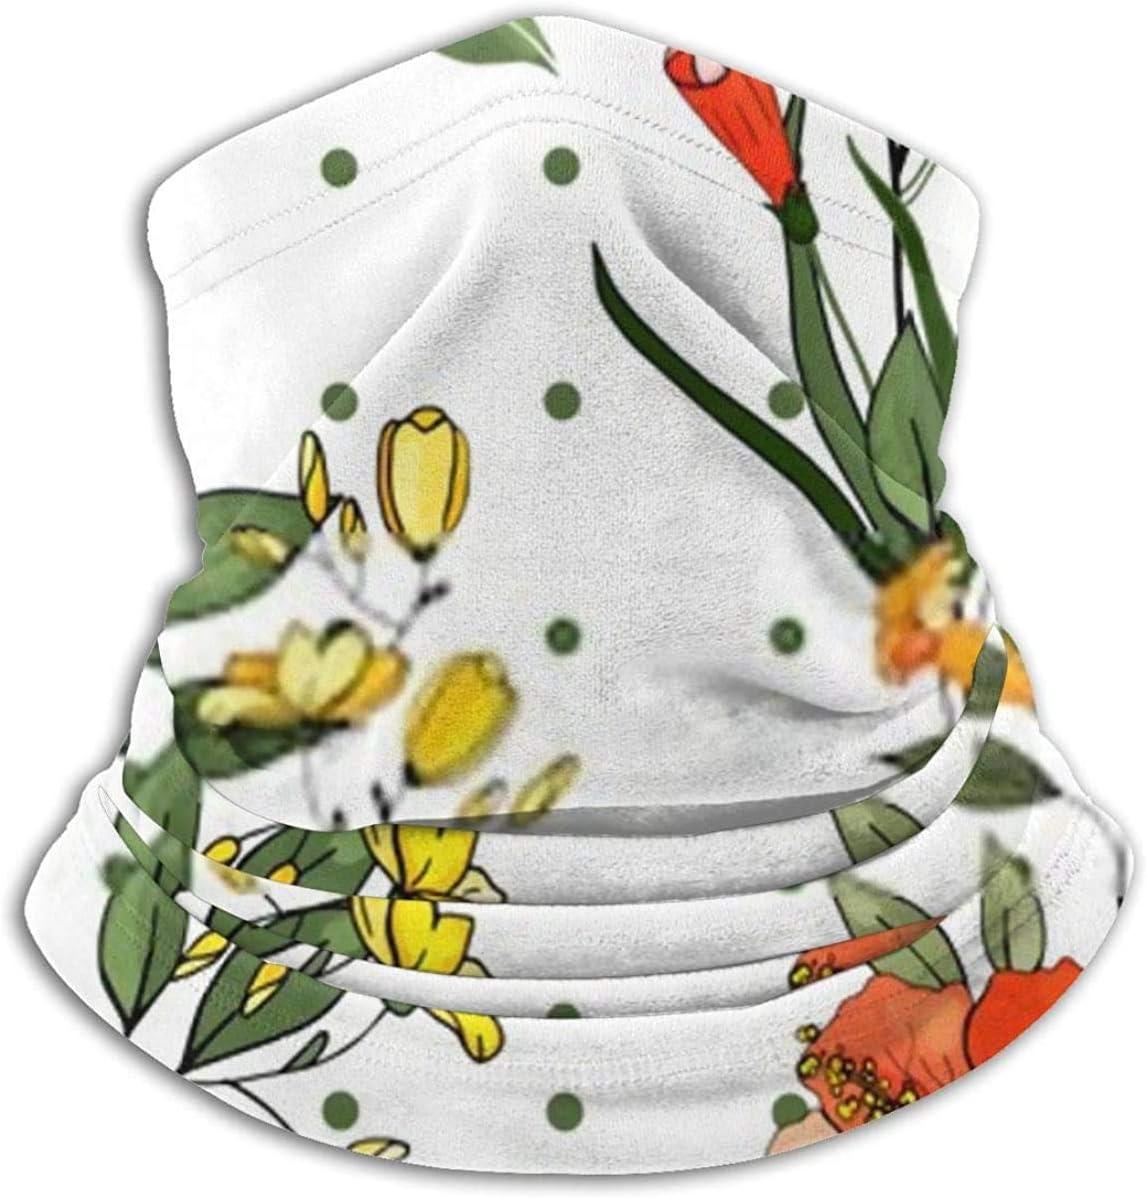 Lastbest Botanical Motifs Isolated Flower Floral Neck Warmer Multifunction Scarf Hat Neck Gaiter Neck Cap Bala Windproof Neck Heating Wrap Outdoor Sports